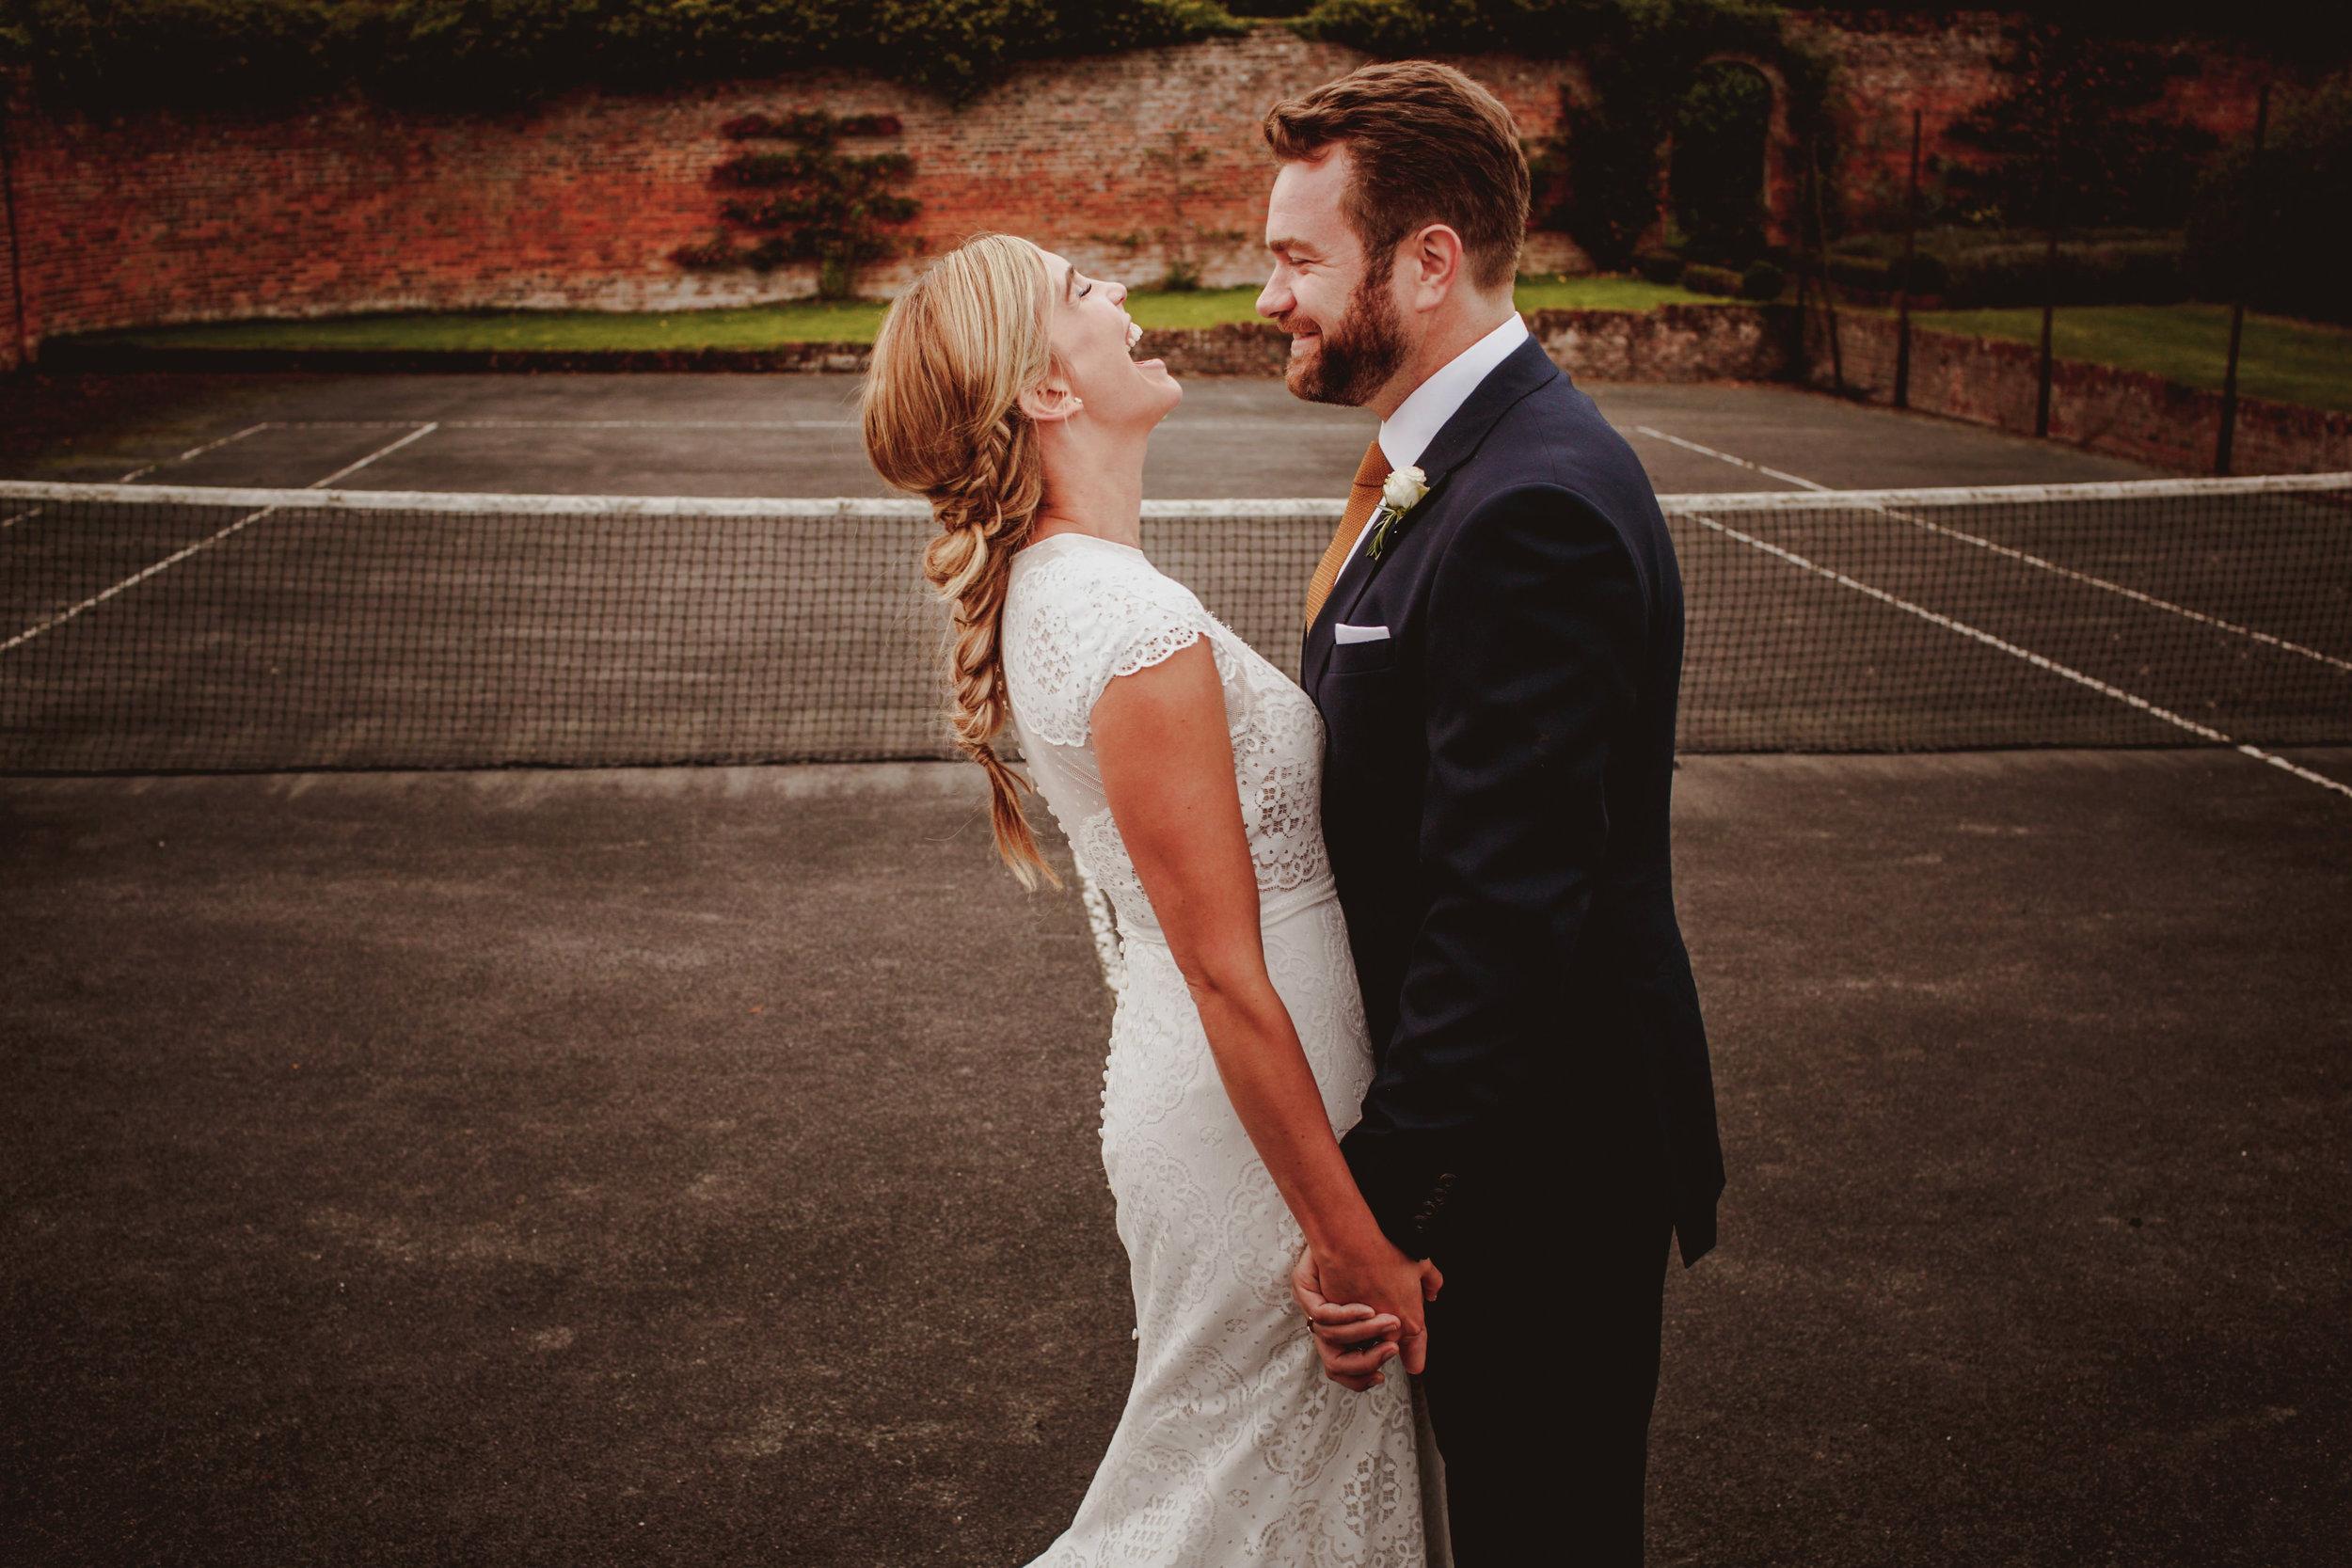 Surrey-wedding-photography-36.jpg